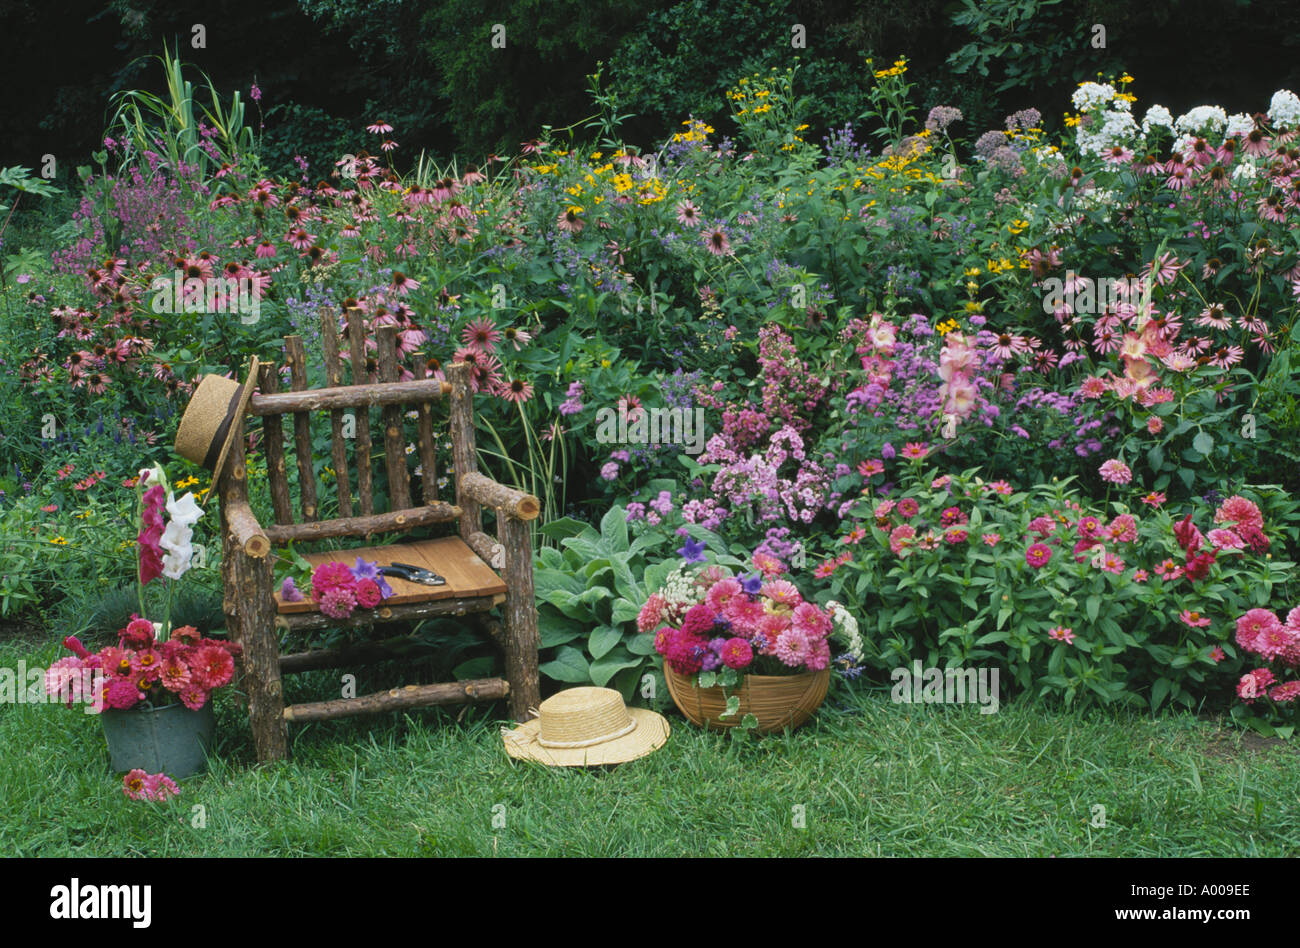 Romantic Garden Rustic Chair In Home Flower Garden Of Pinks And